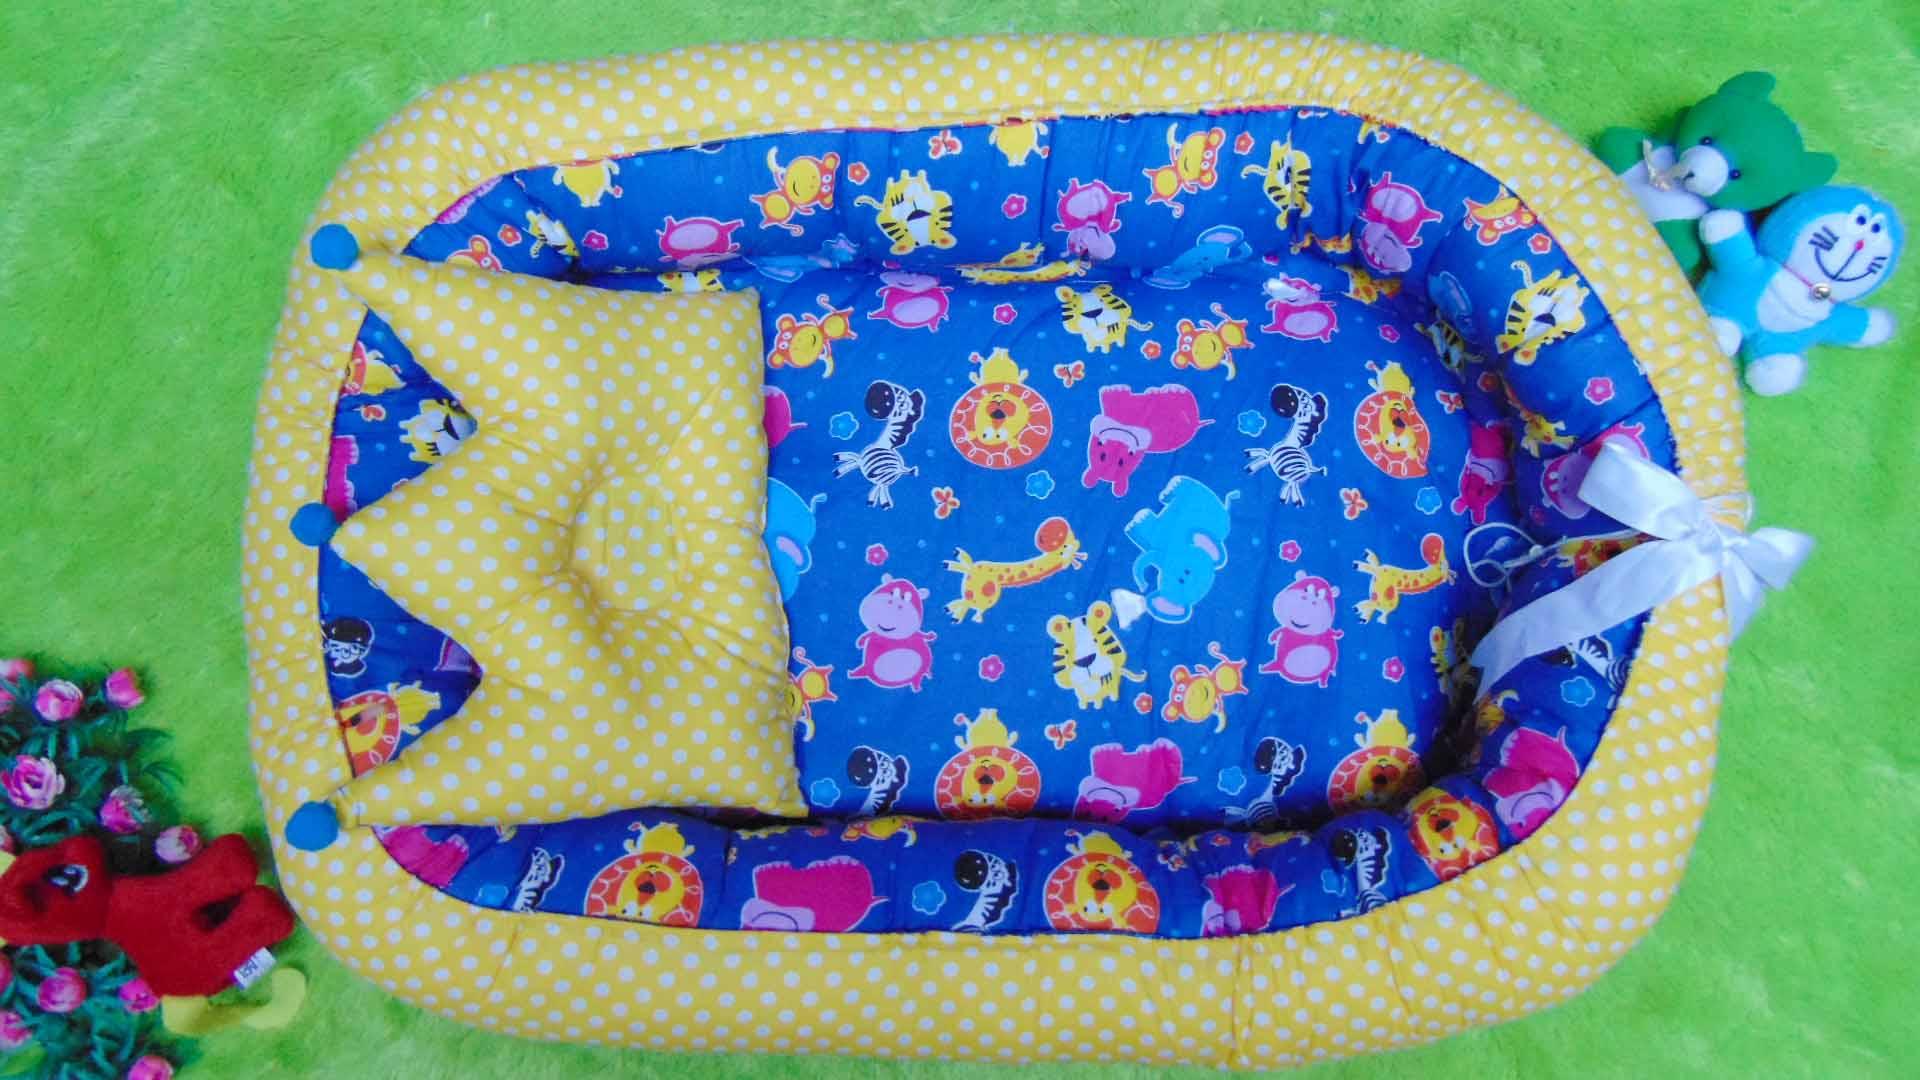 Kado Lahiran Terbaik Murah Baby Nest Kasur Bayi BONUS BANTAL PEYANG motif safari blue yellow